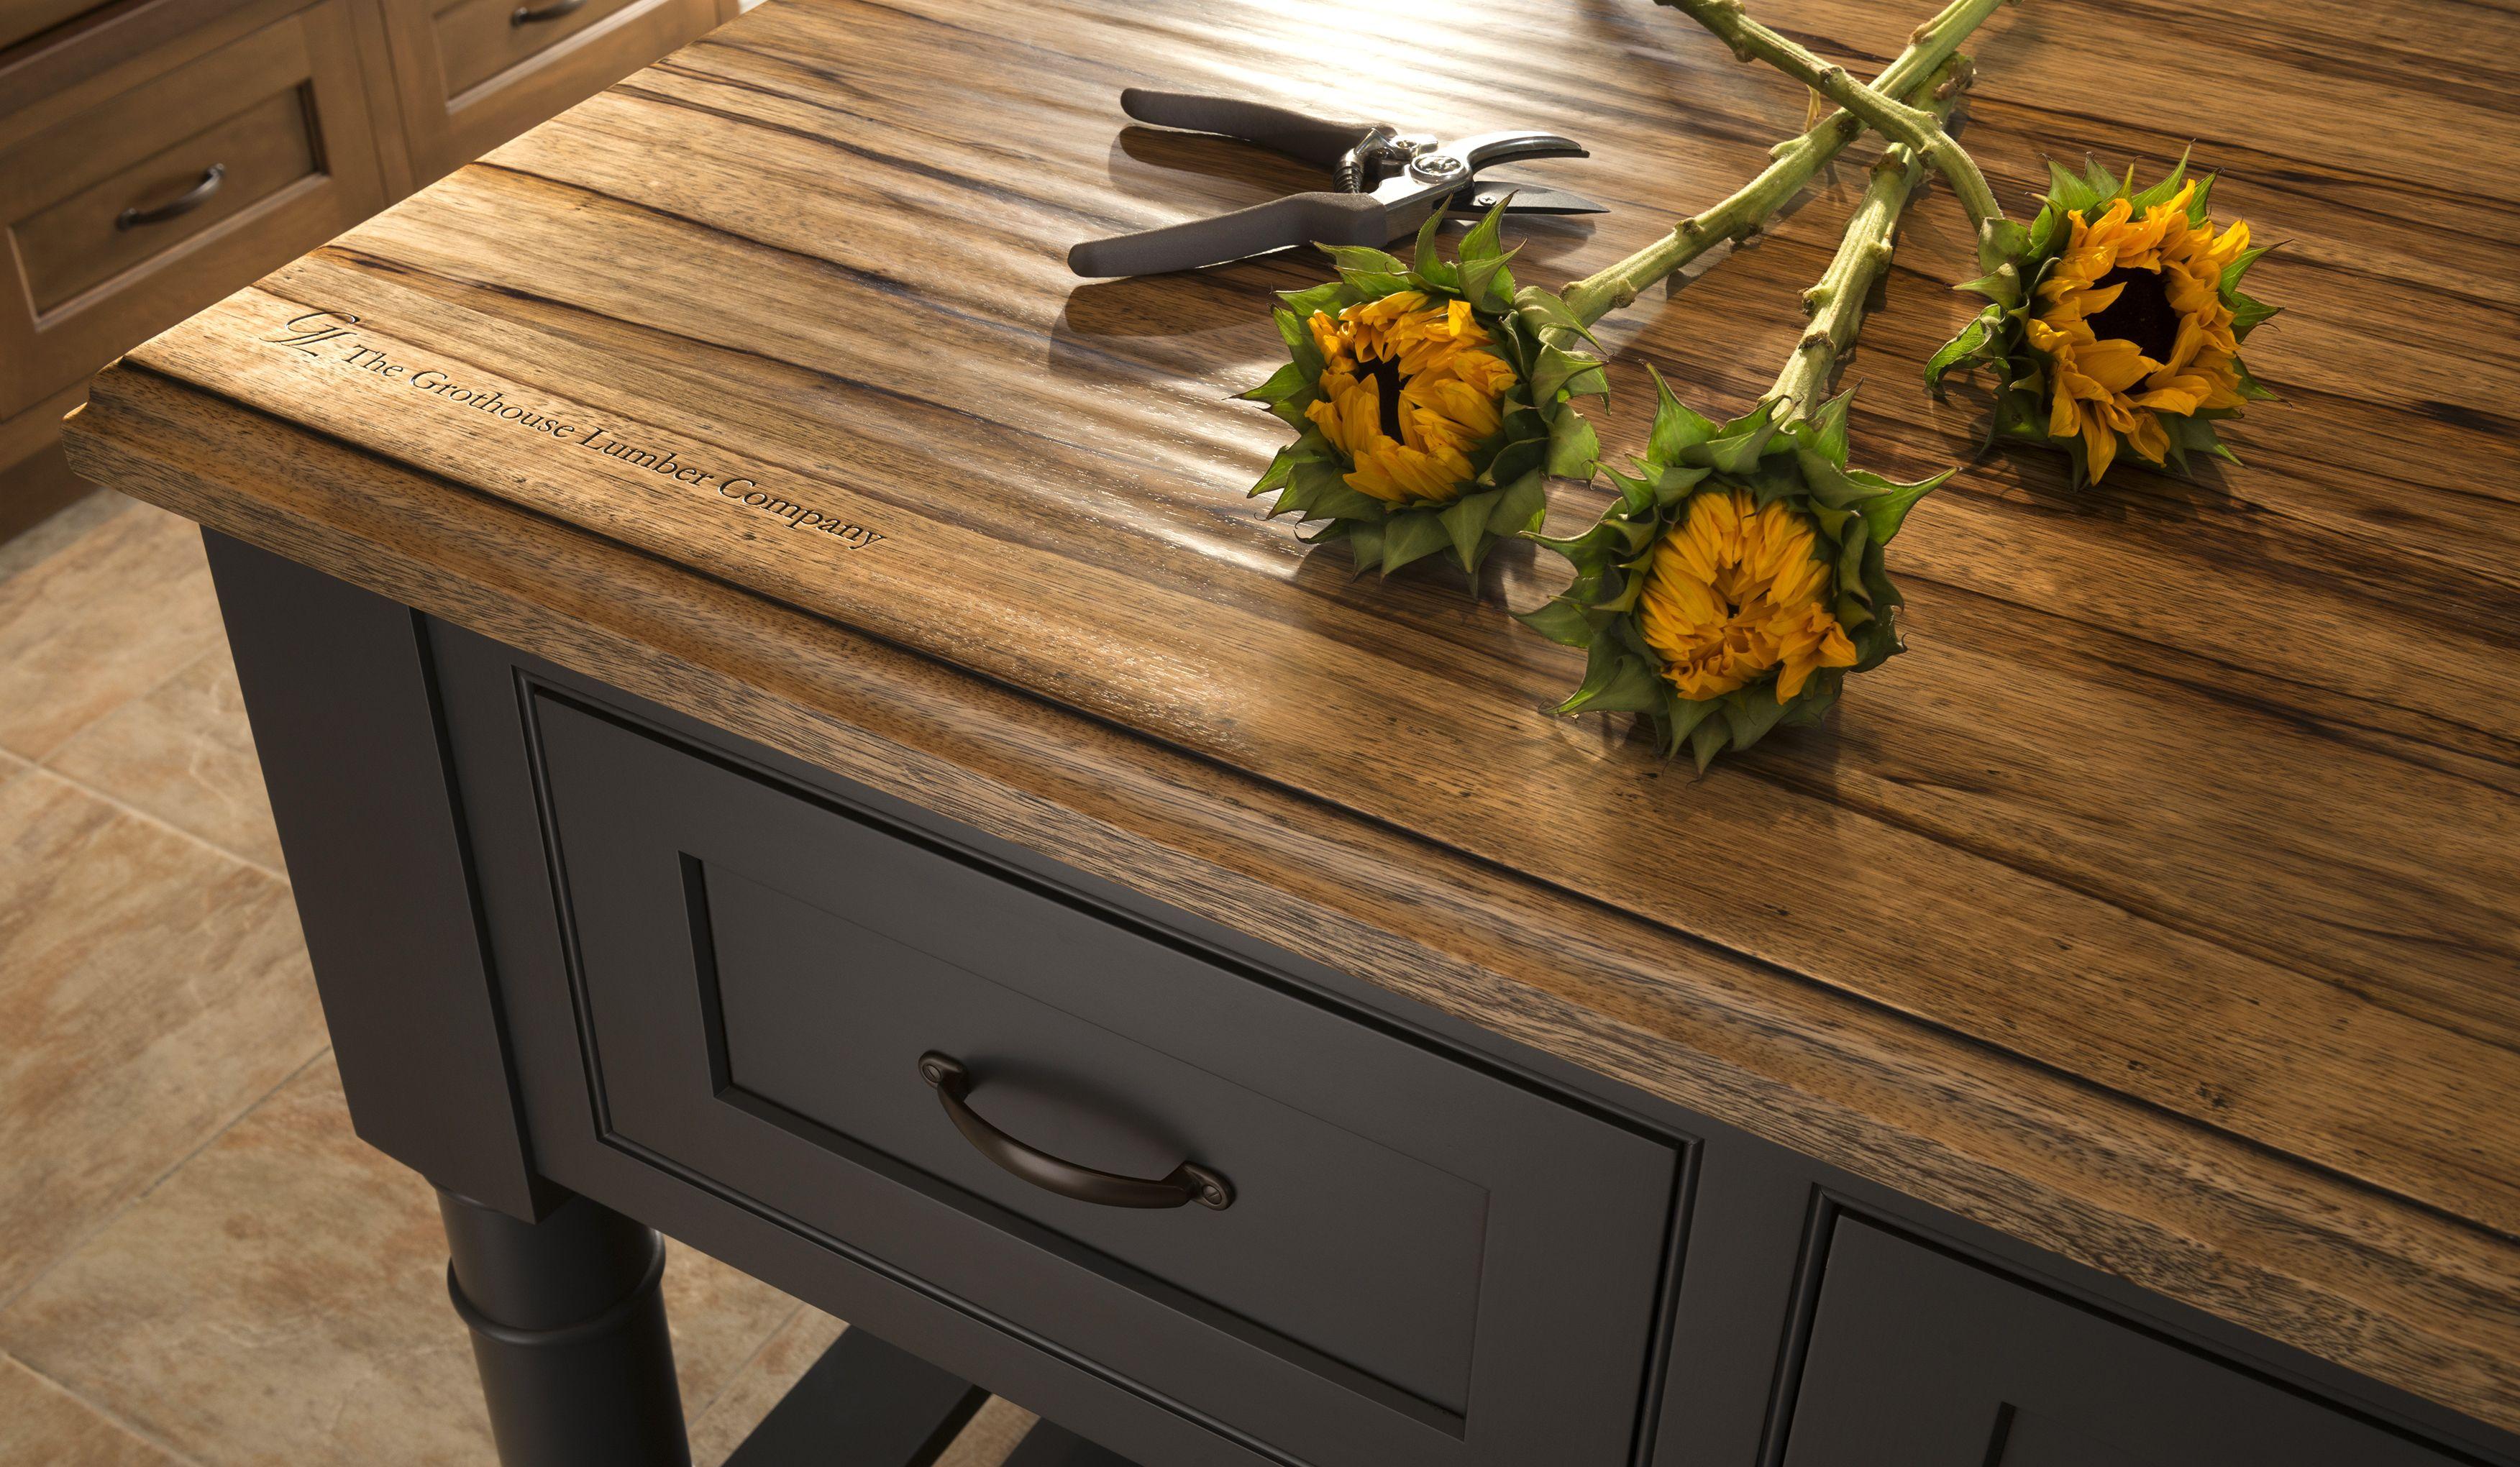 Rustic Wood Countertops Wood countertops kitchen, Rustic